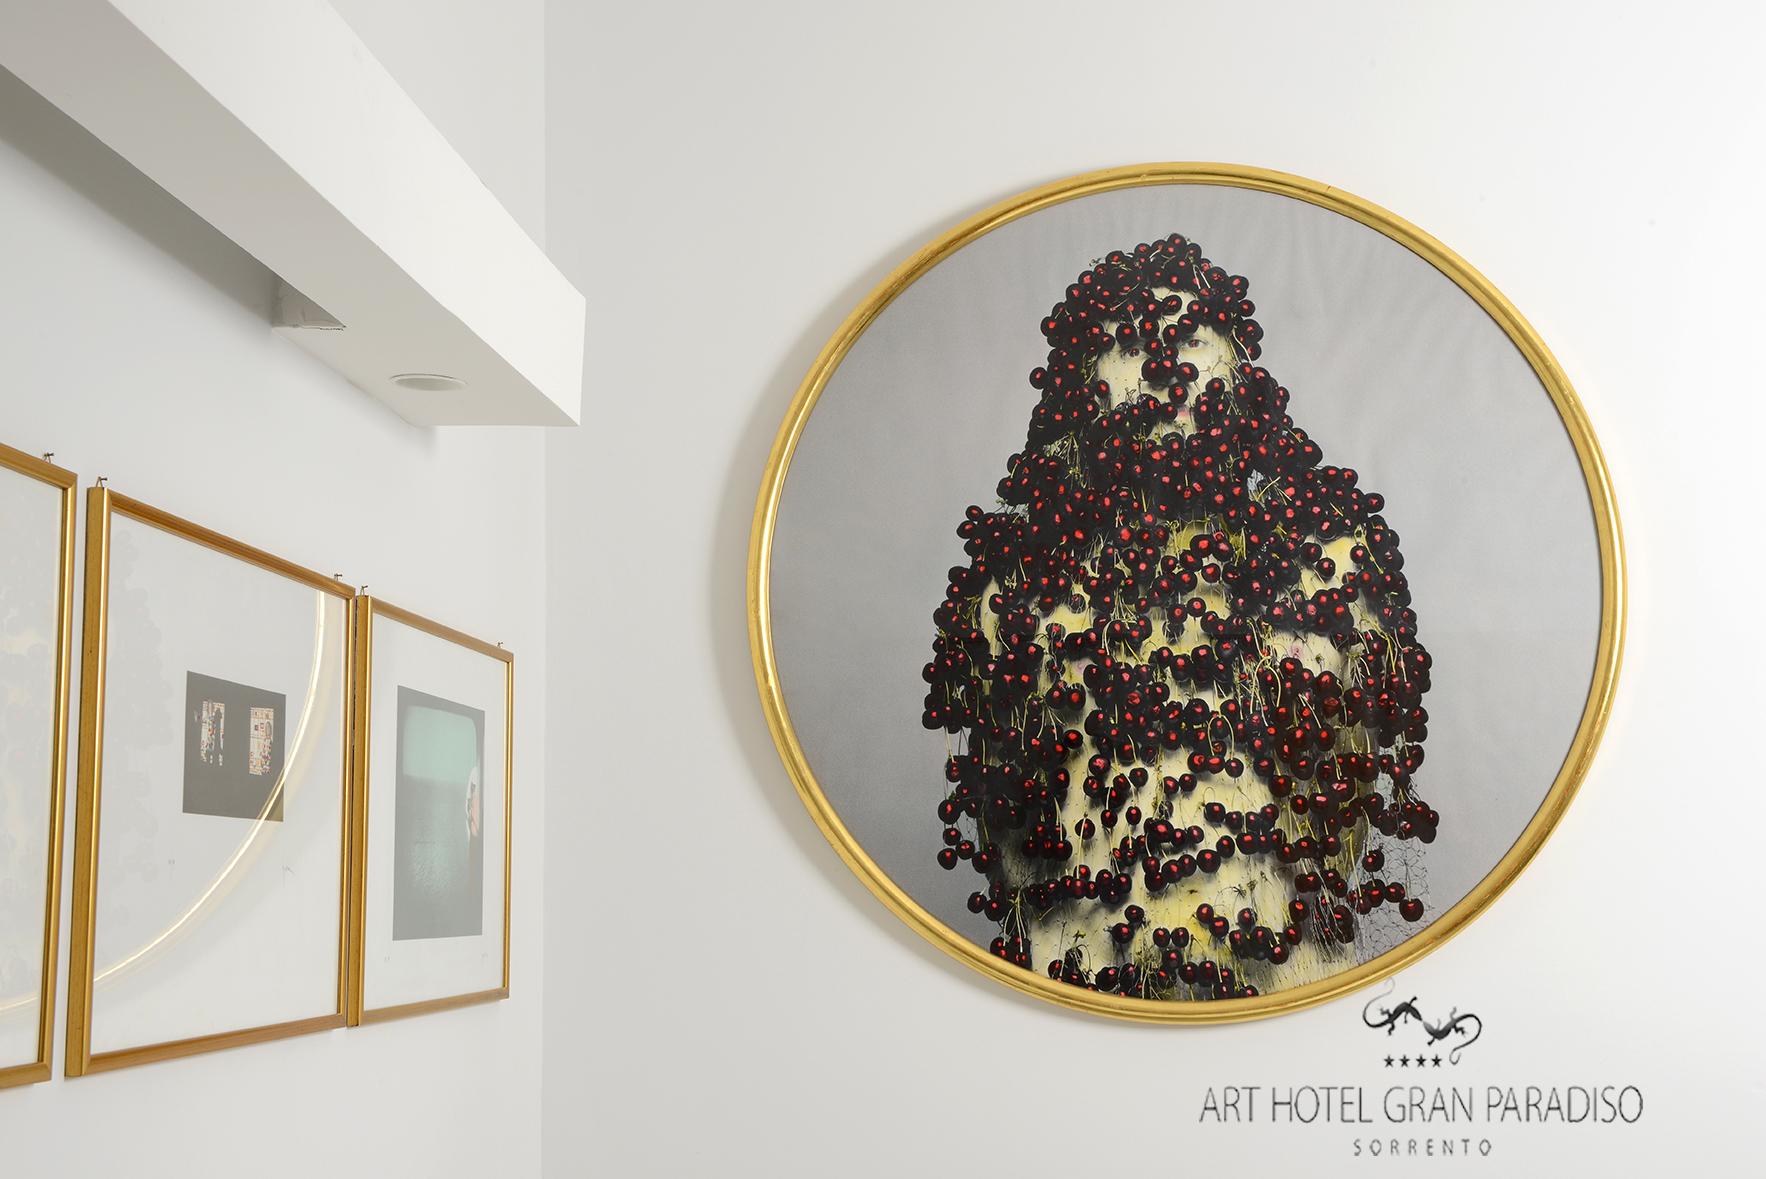 Art_Hotel_Gran_Paradiso_2013_411_Luigi_Ontani_4.jpg